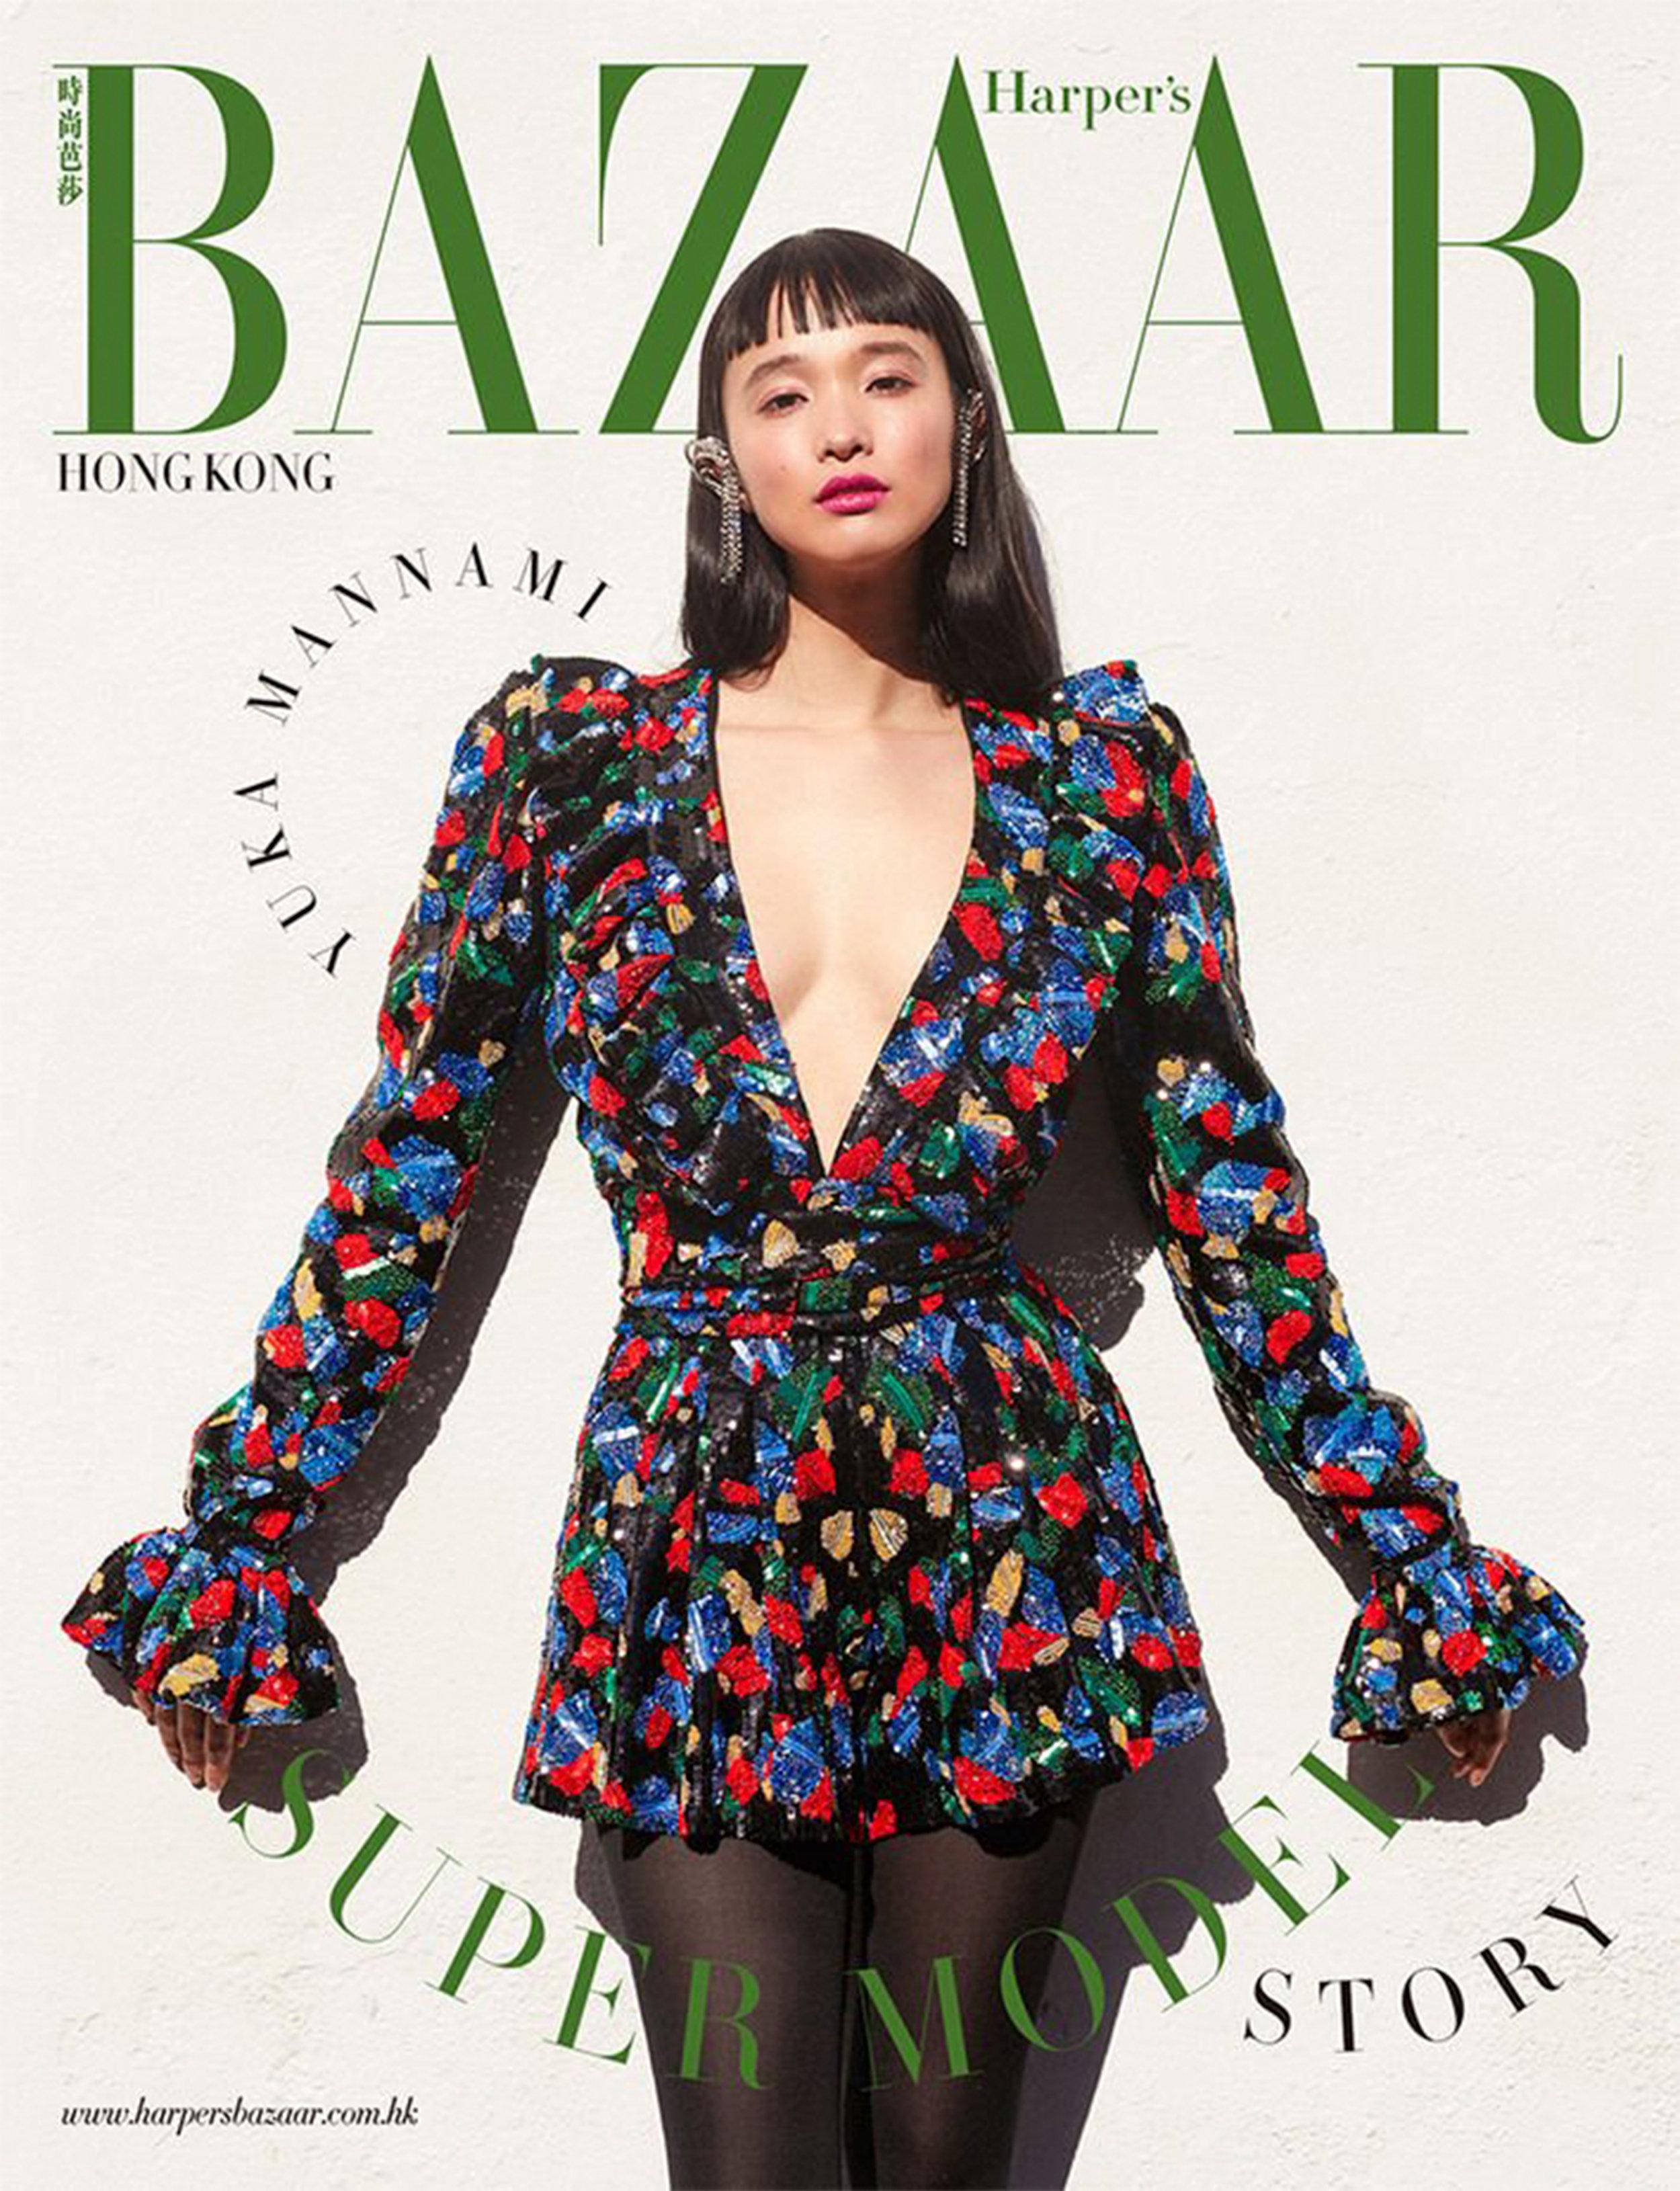 Harper's Bazaar HK - Yuka Mannami